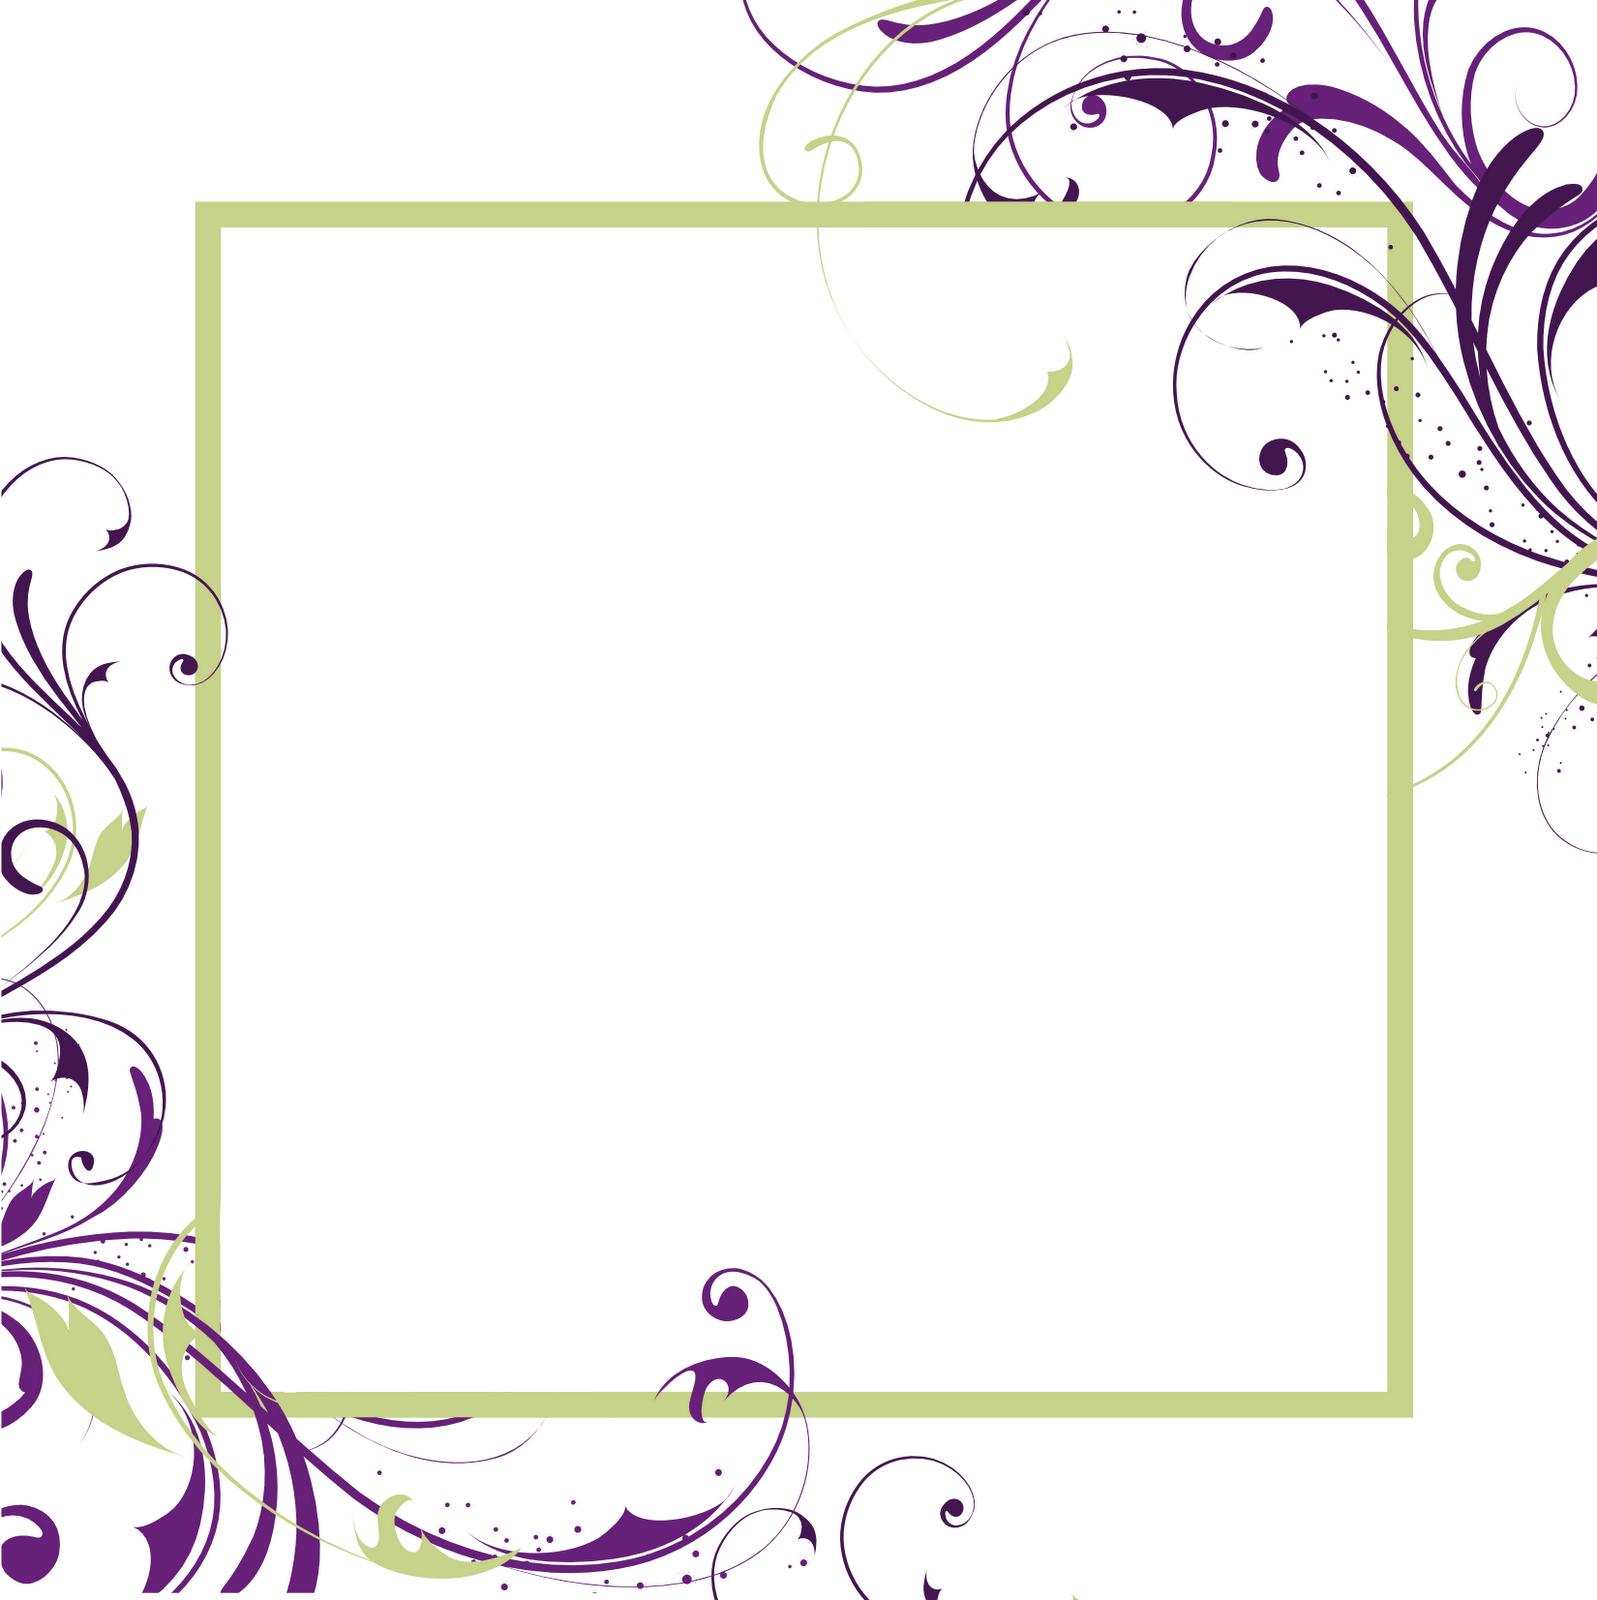 Free Printable Blank Invitations Templates | Wedding Invite Regarding Blank Templates For Invitations